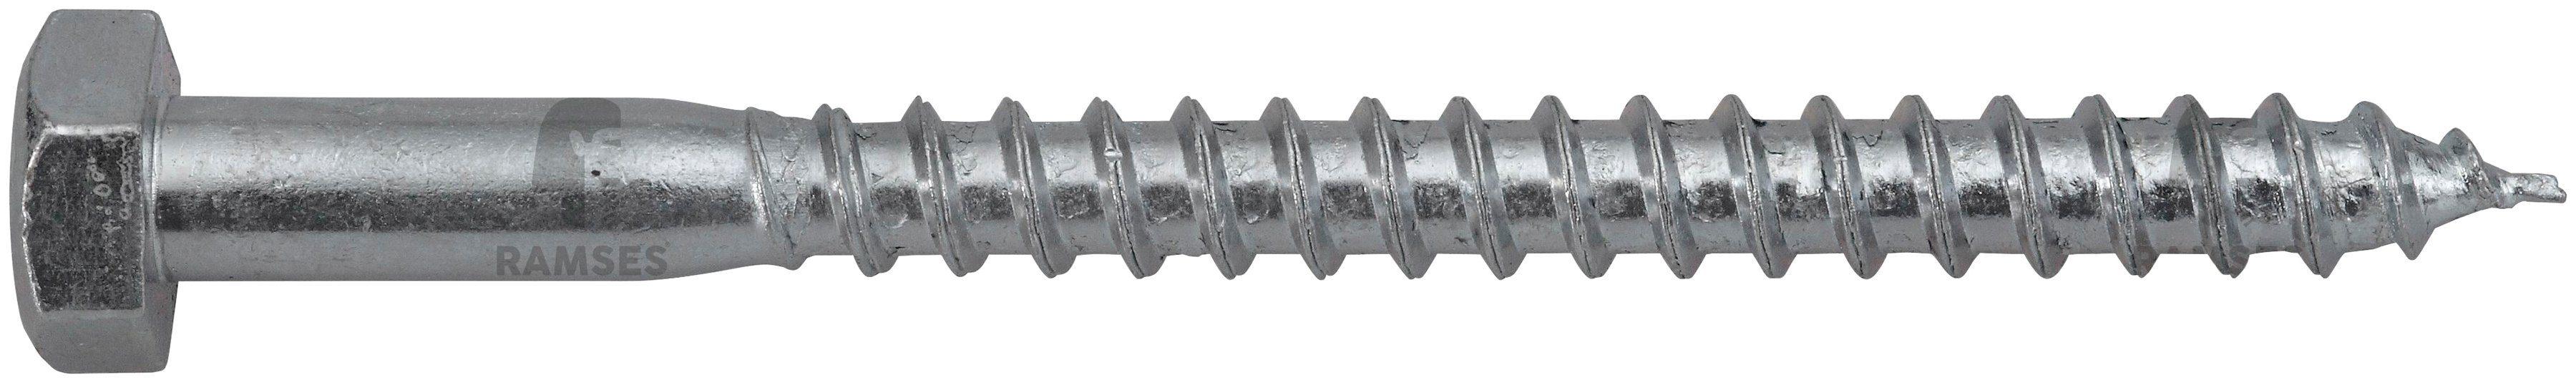 RAMSES Schrauben , Sechskant-Holzschraube 12 x 60 mm 50 Stk.